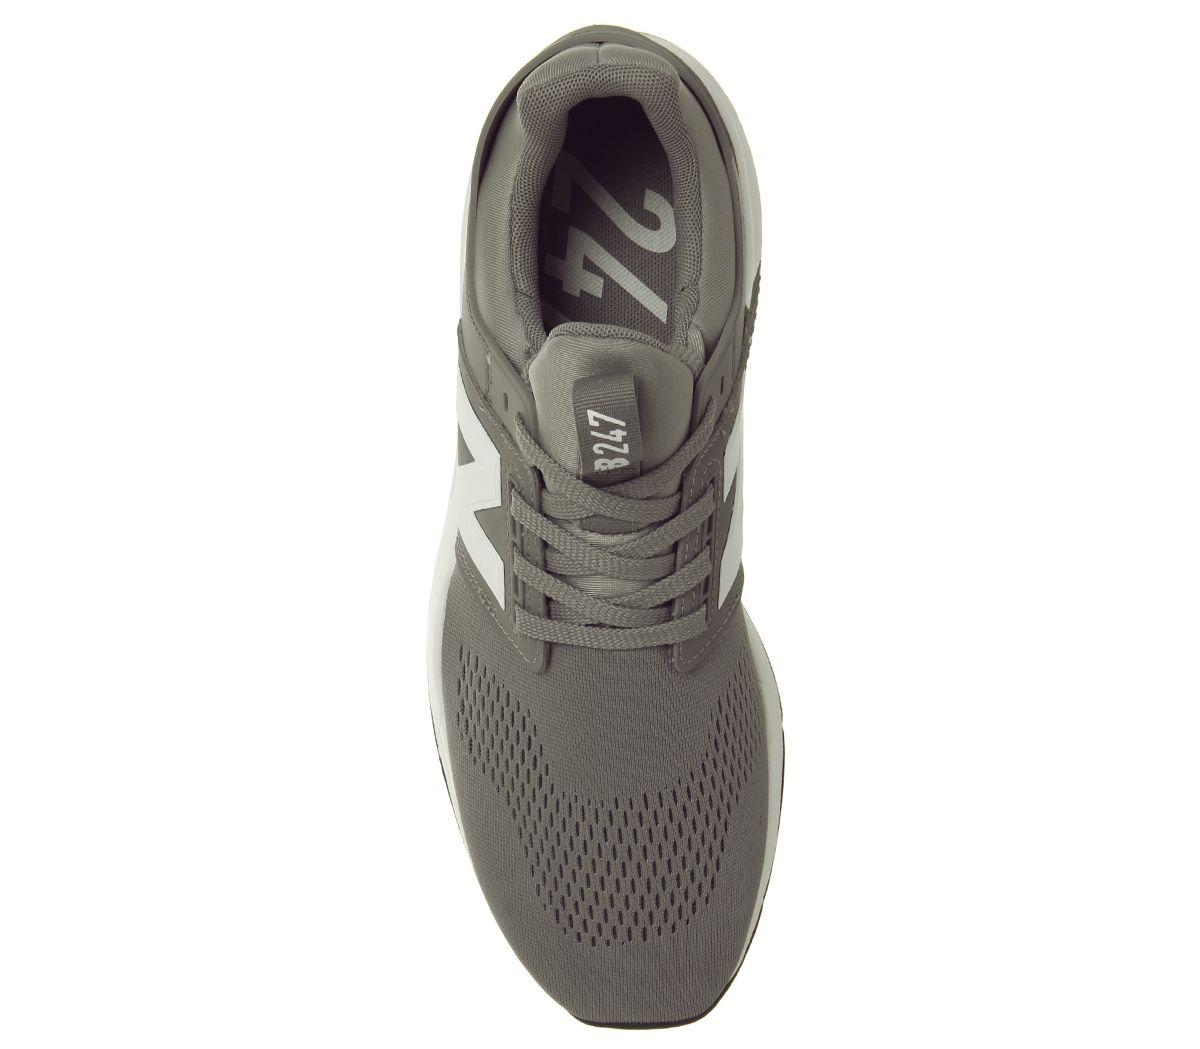 New-Balance-247V2-Baskets-Marblehead-Baskets-Chaussures miniature 10